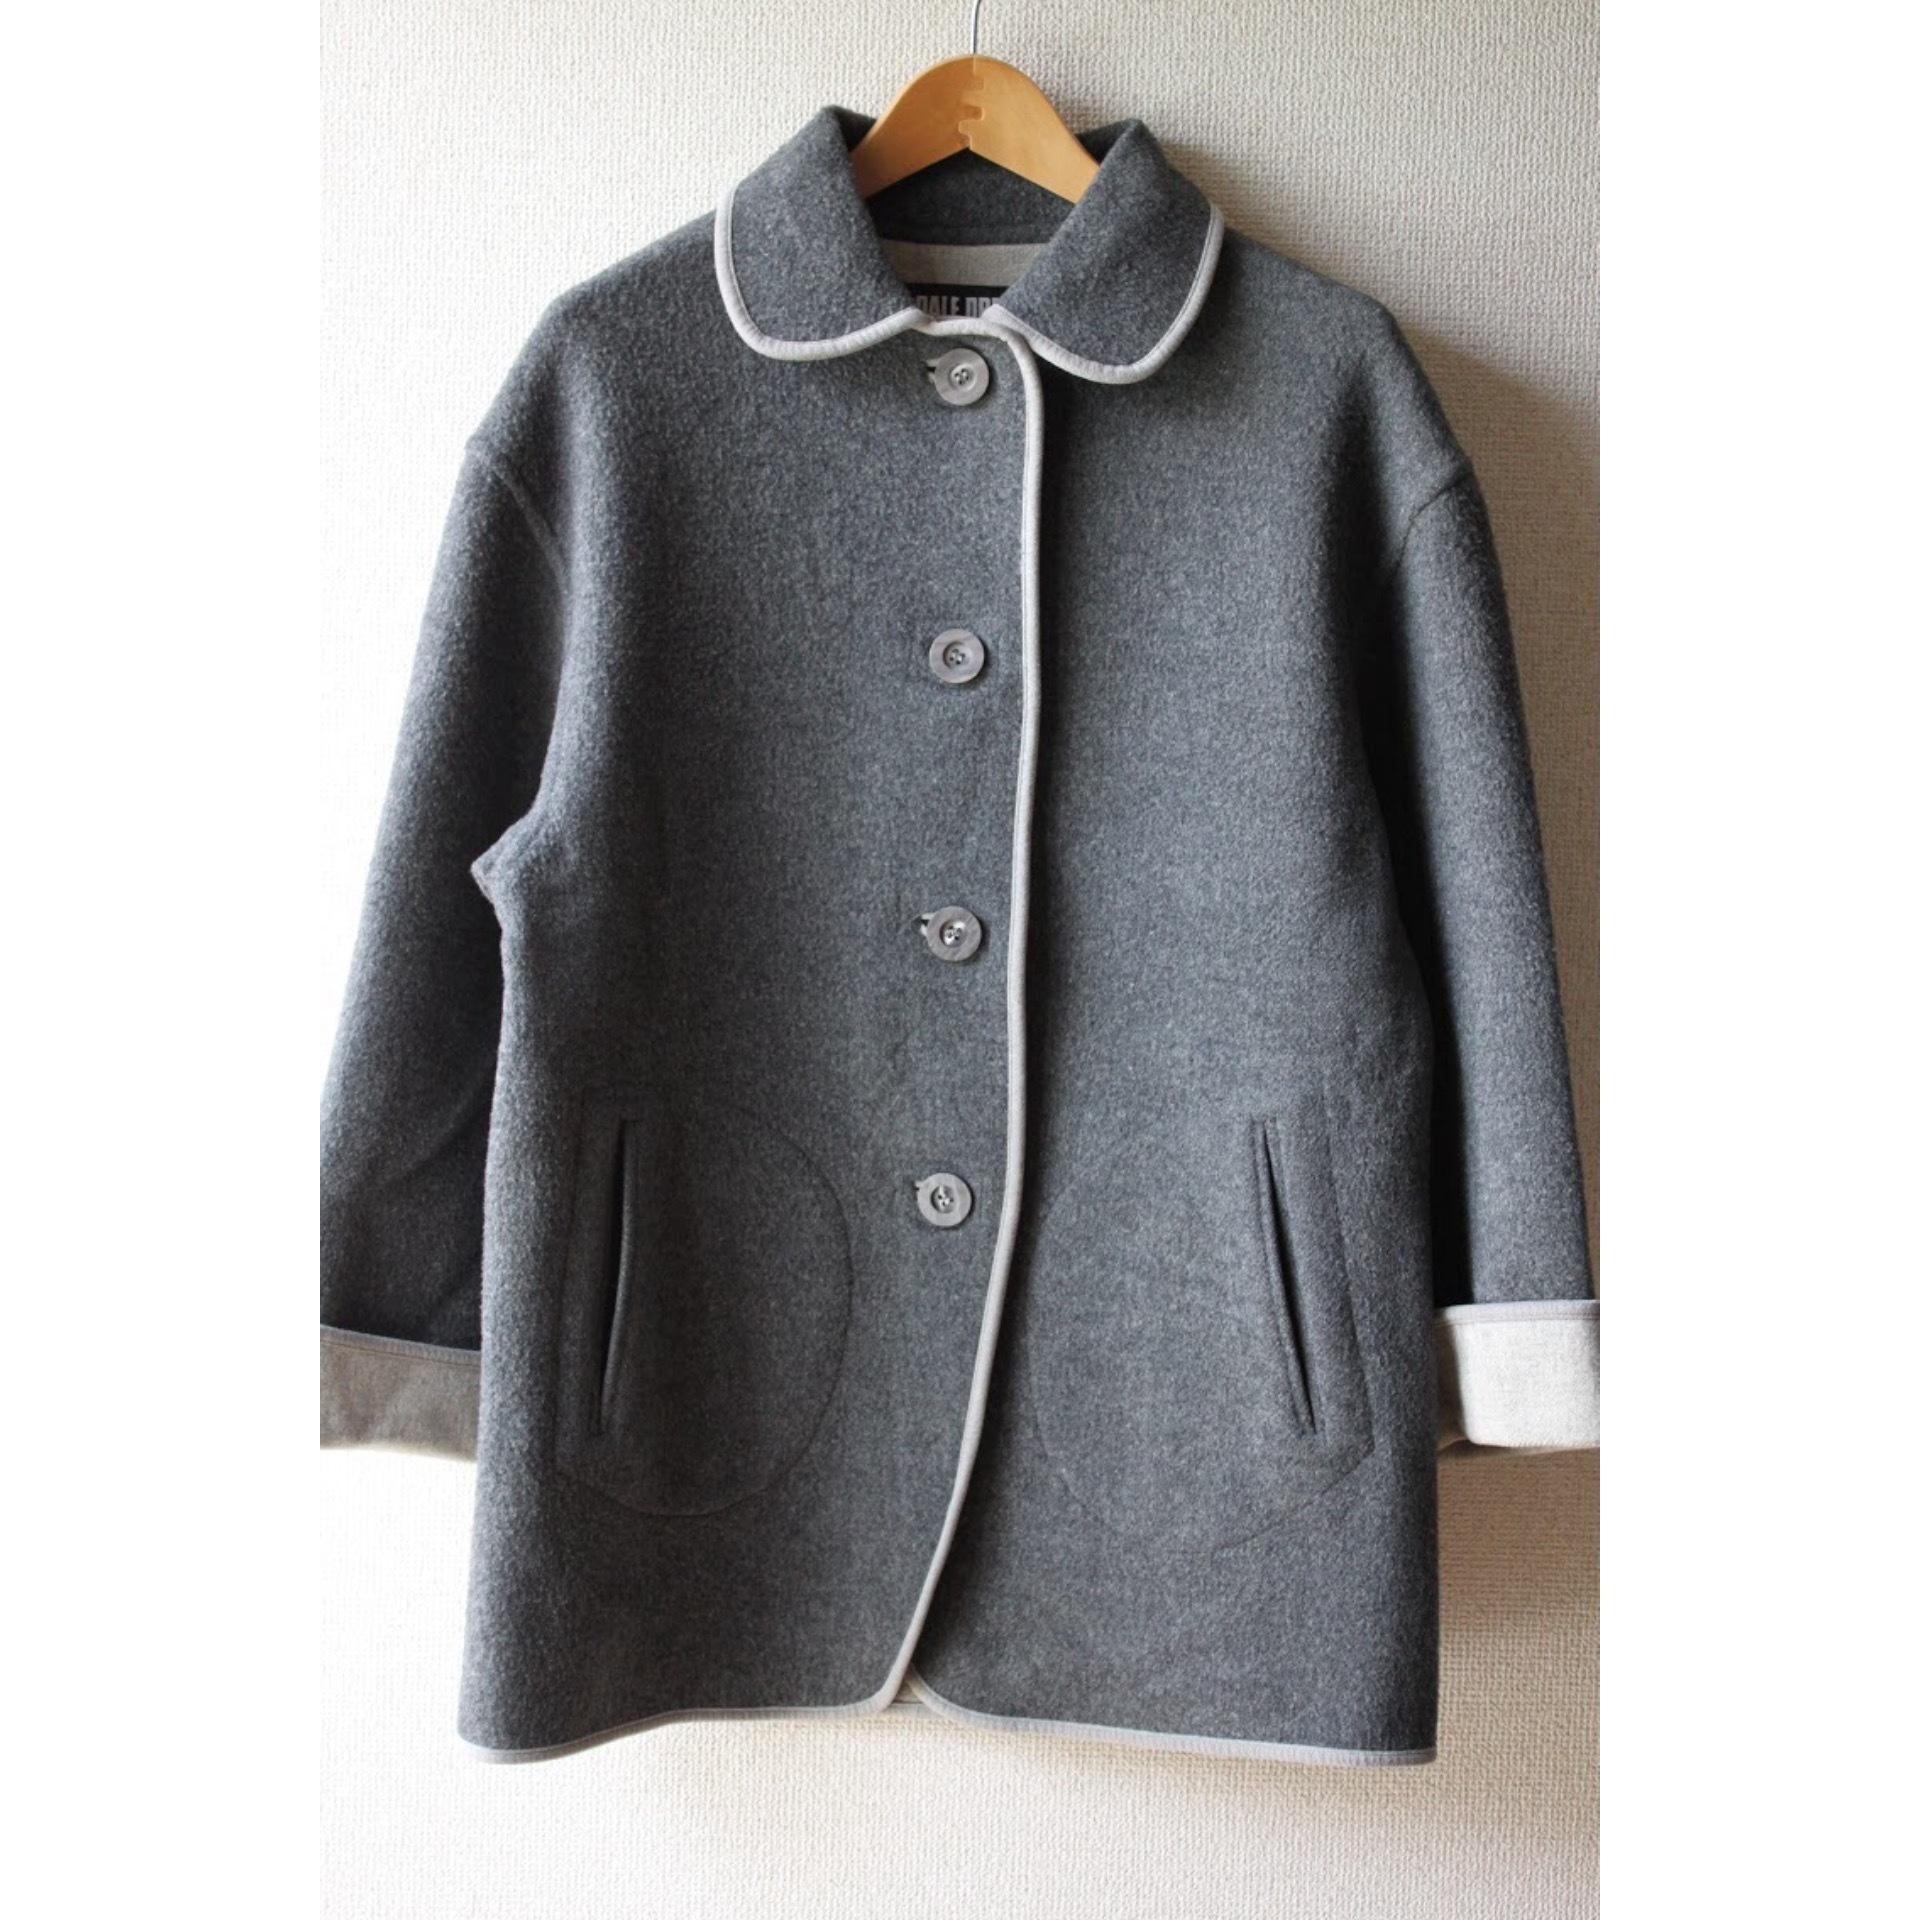 Vintage wool jacket